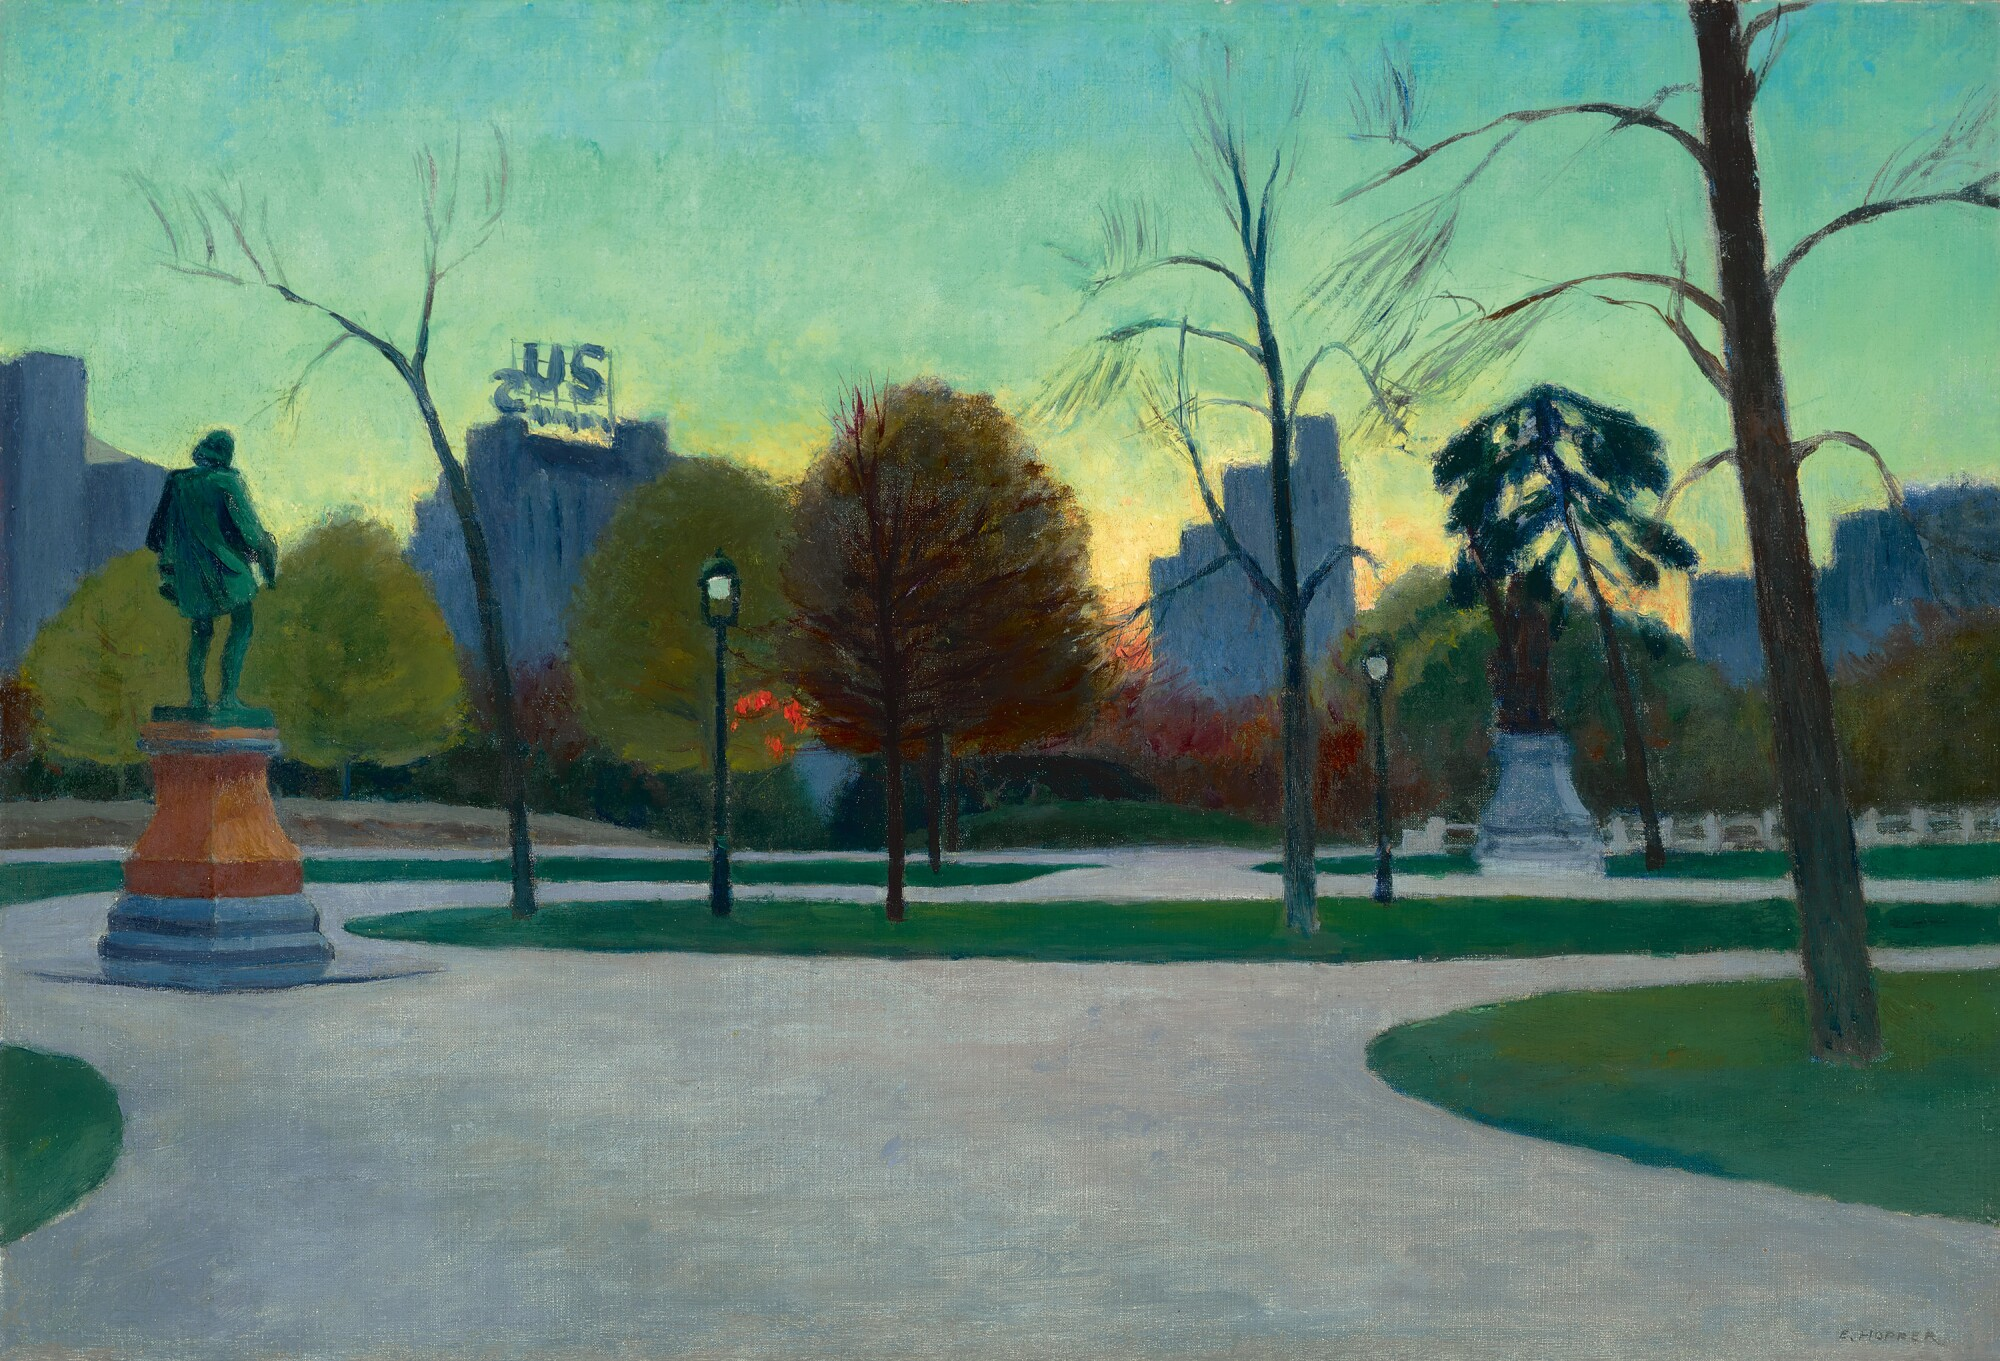 Edward Hopper's Central Park   American Art   Sotheby's